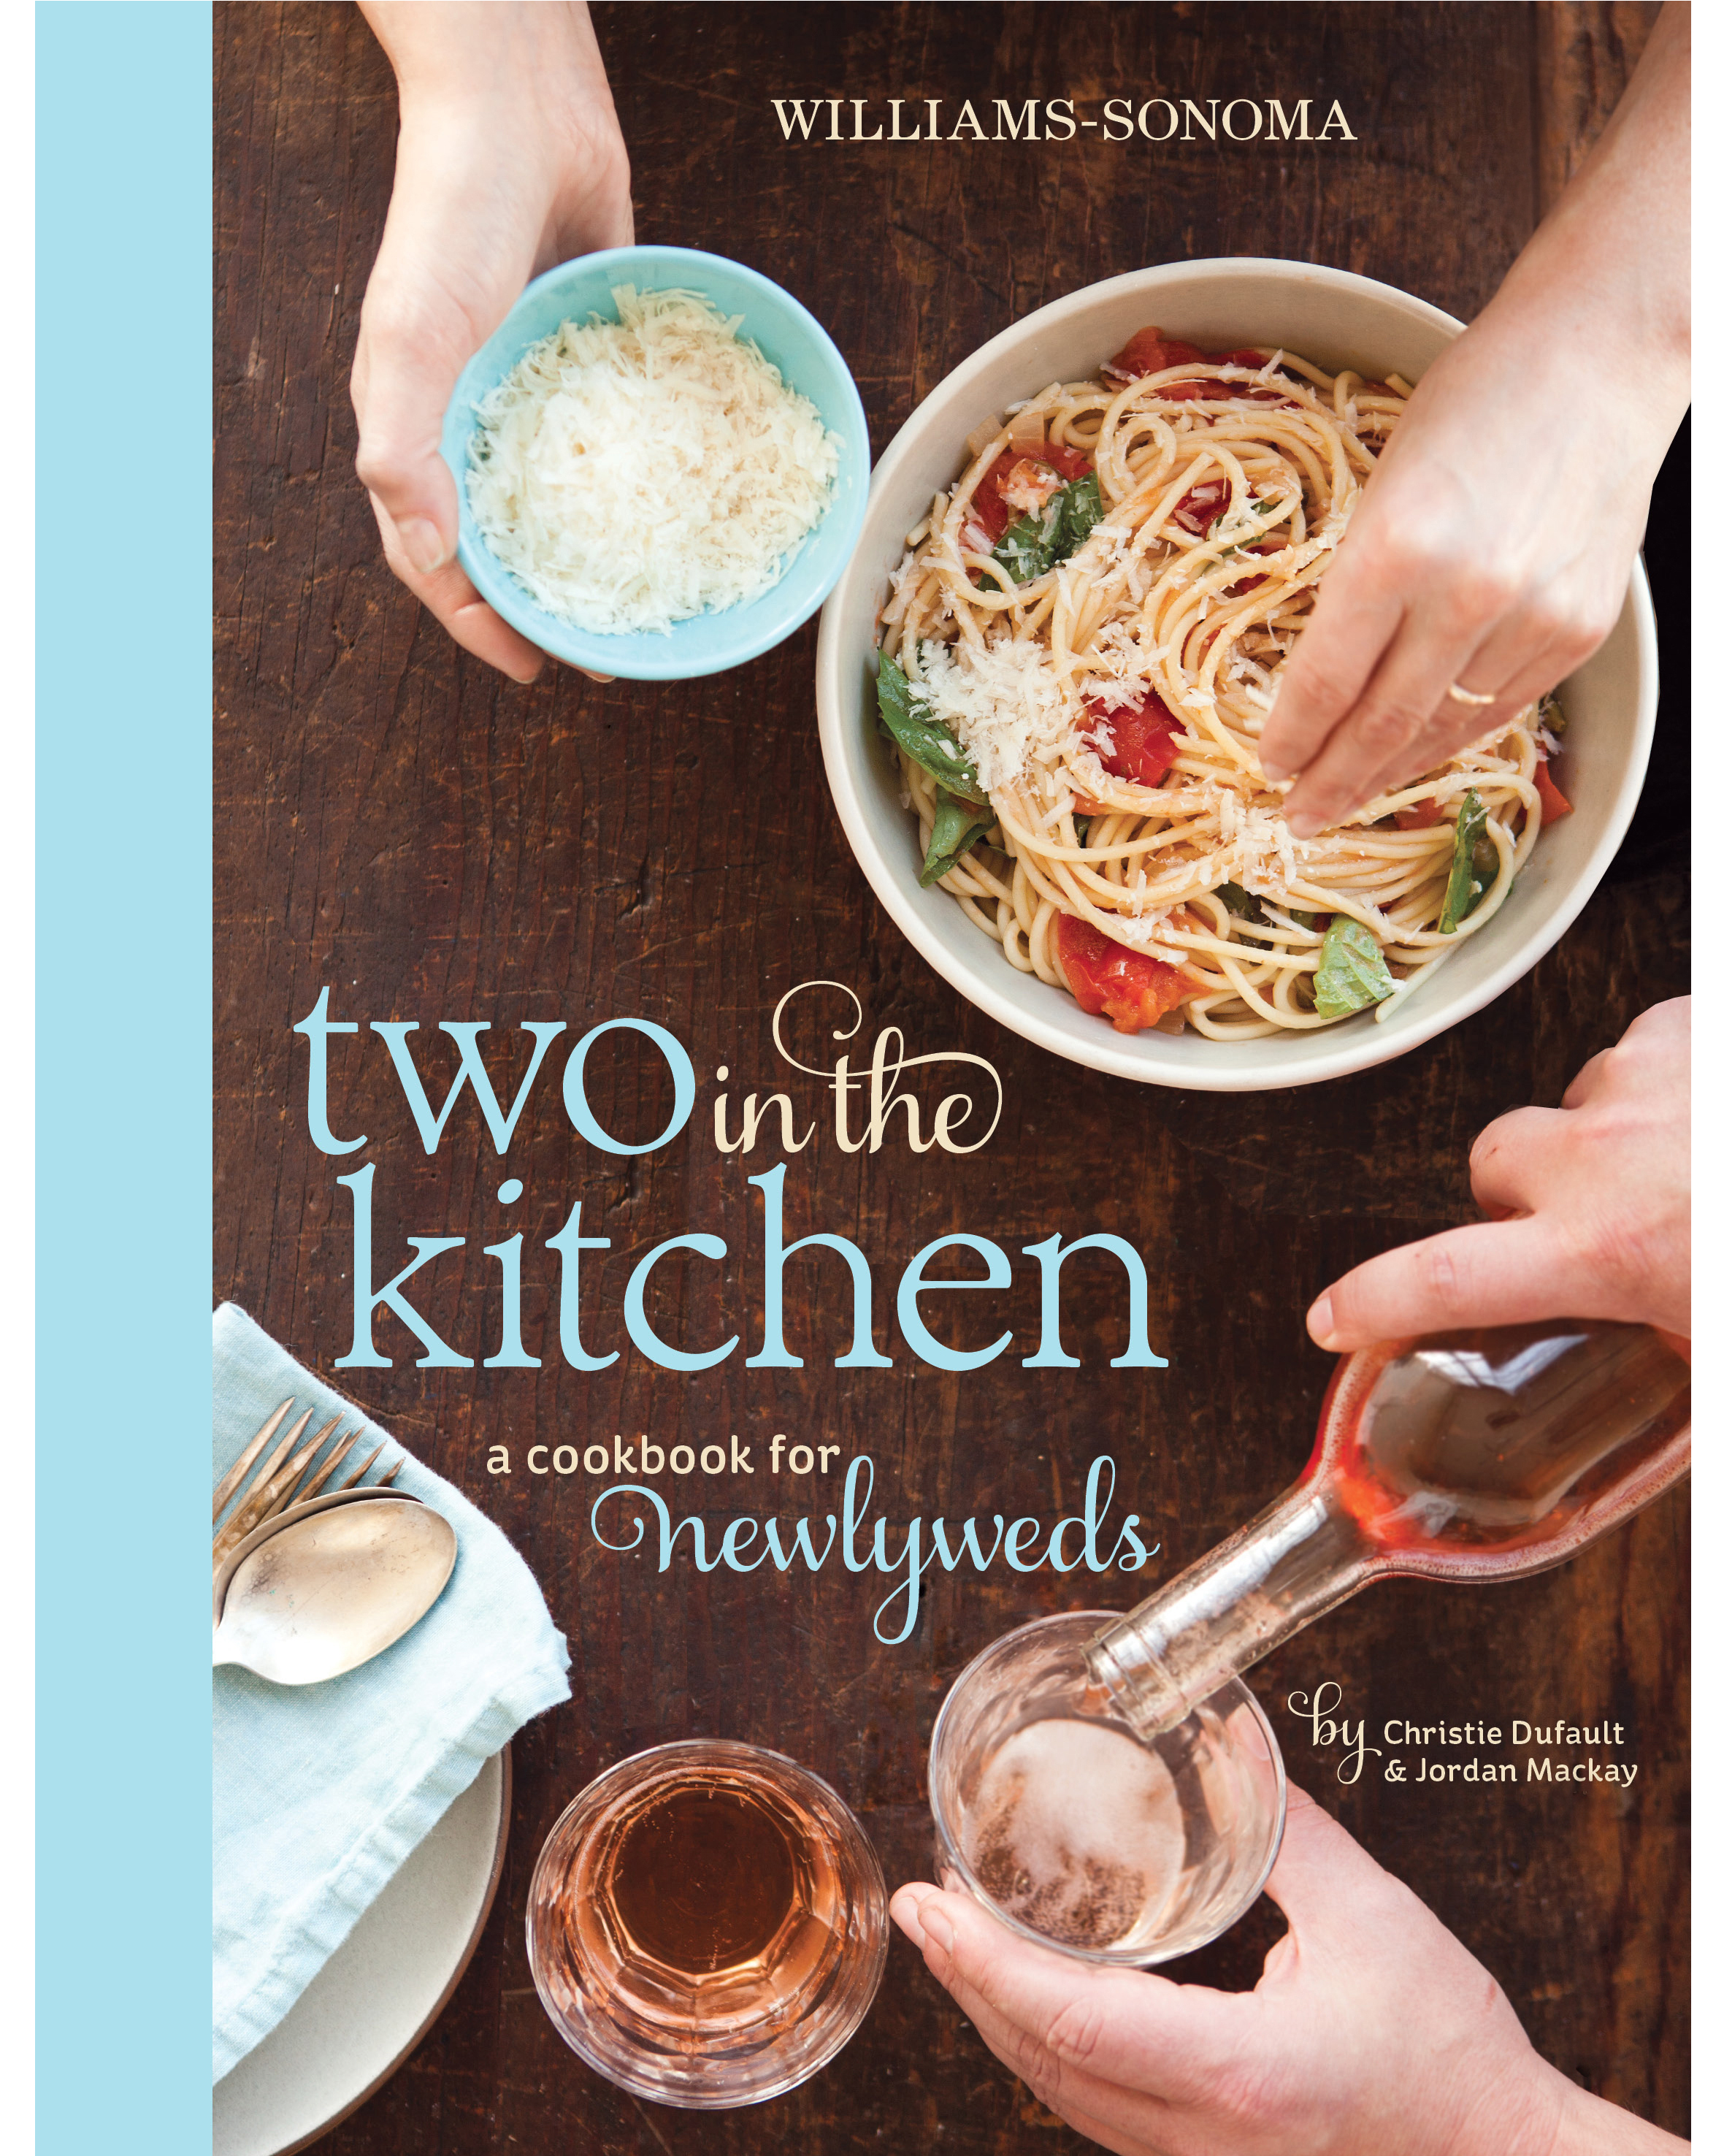 newlywed-cookbooks-two-kitchen-1015.jpg